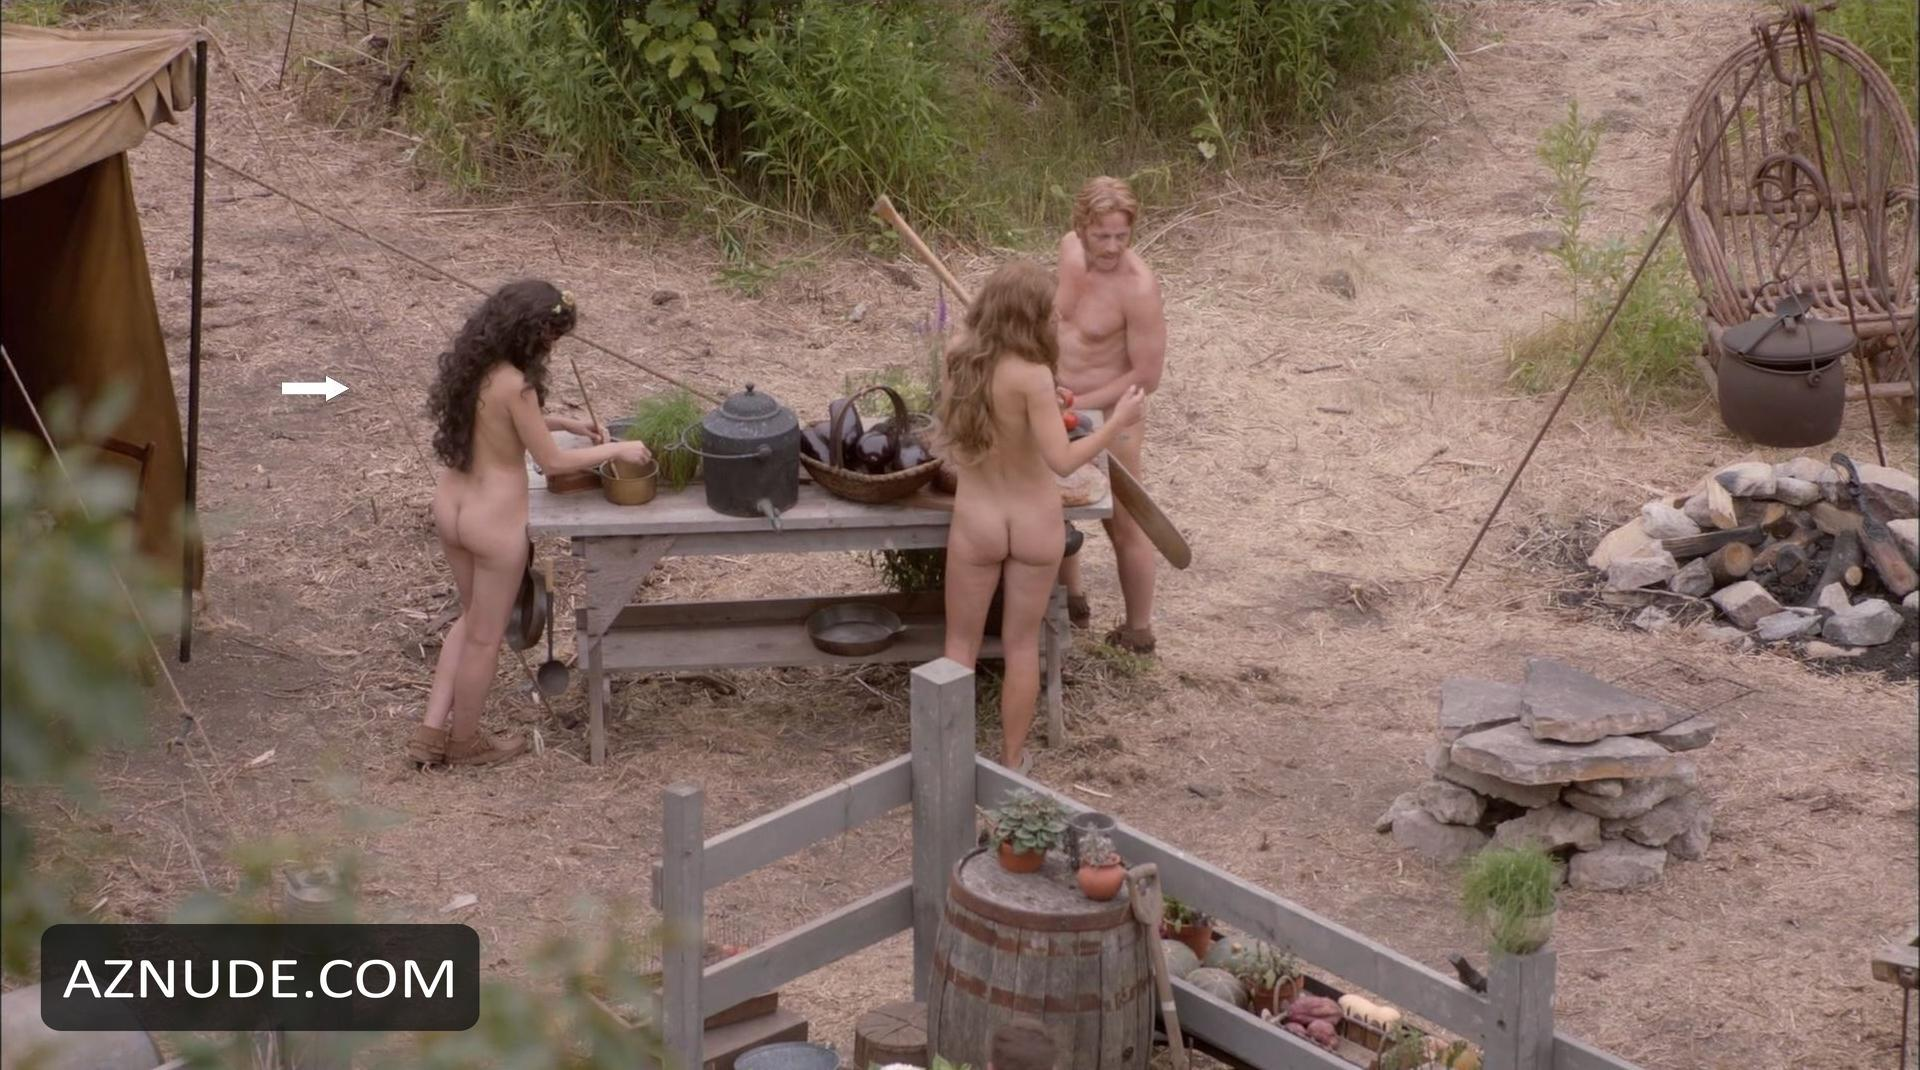 Amber Goldfarb Nude amber goldfarb nude - aznude